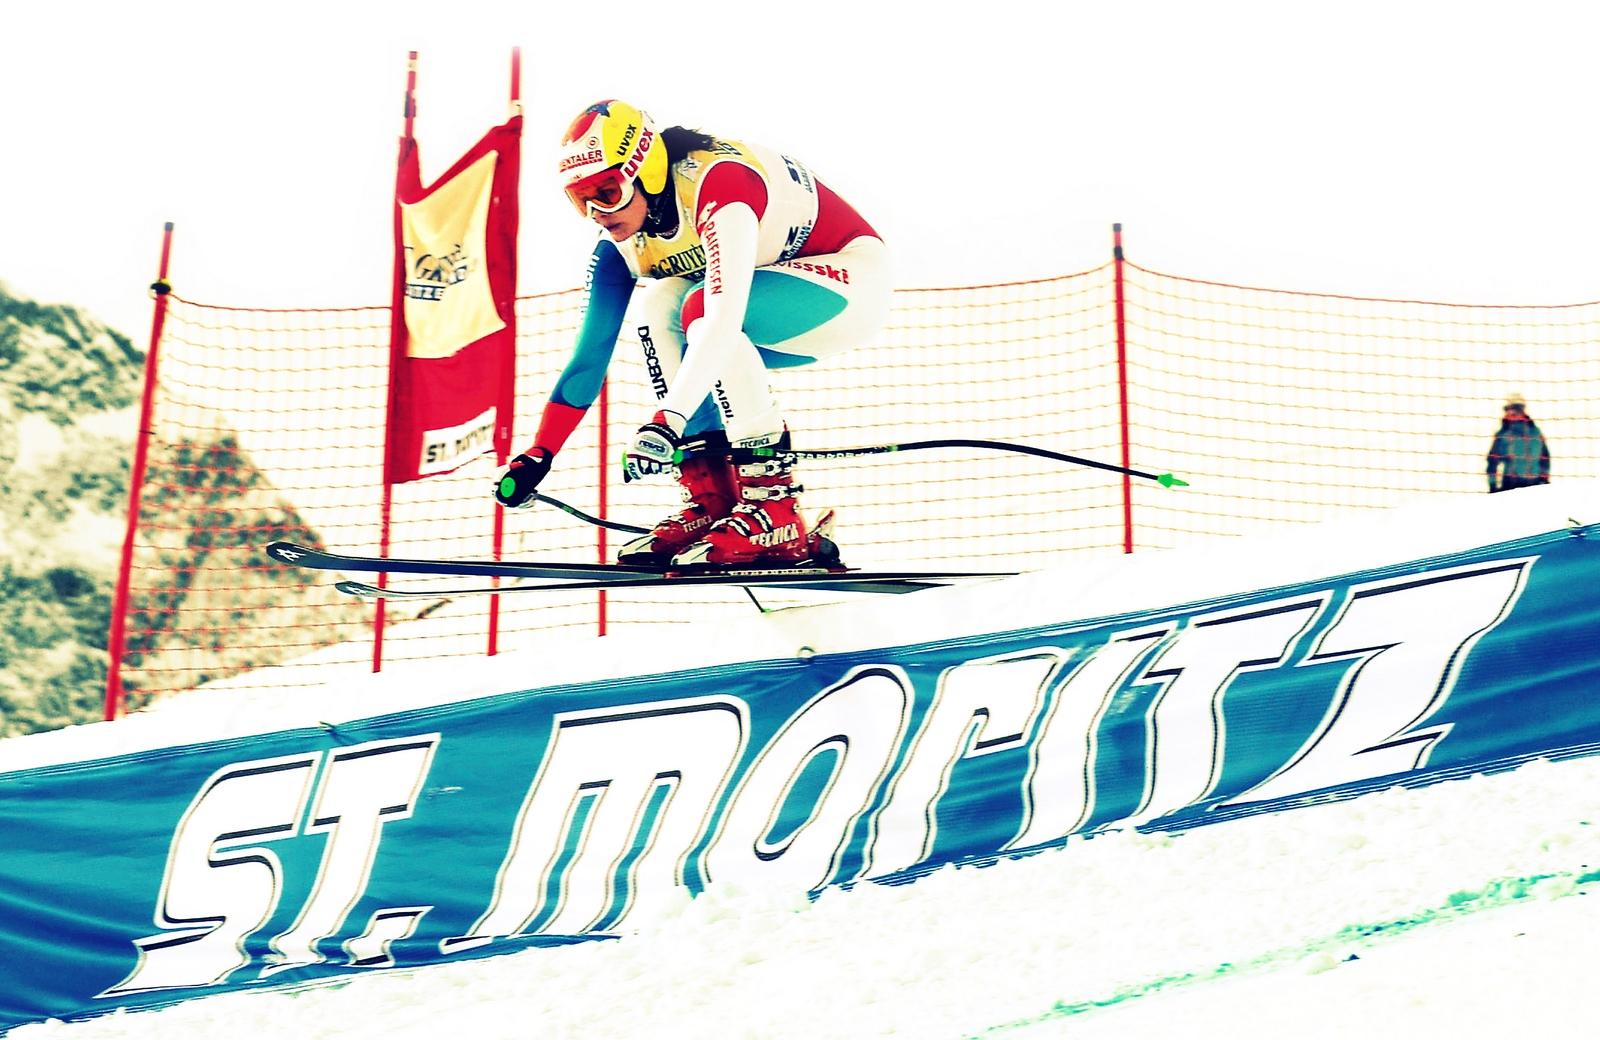 ENGADIN St. Moritz: Damen Weltcup St. Moritz 2010